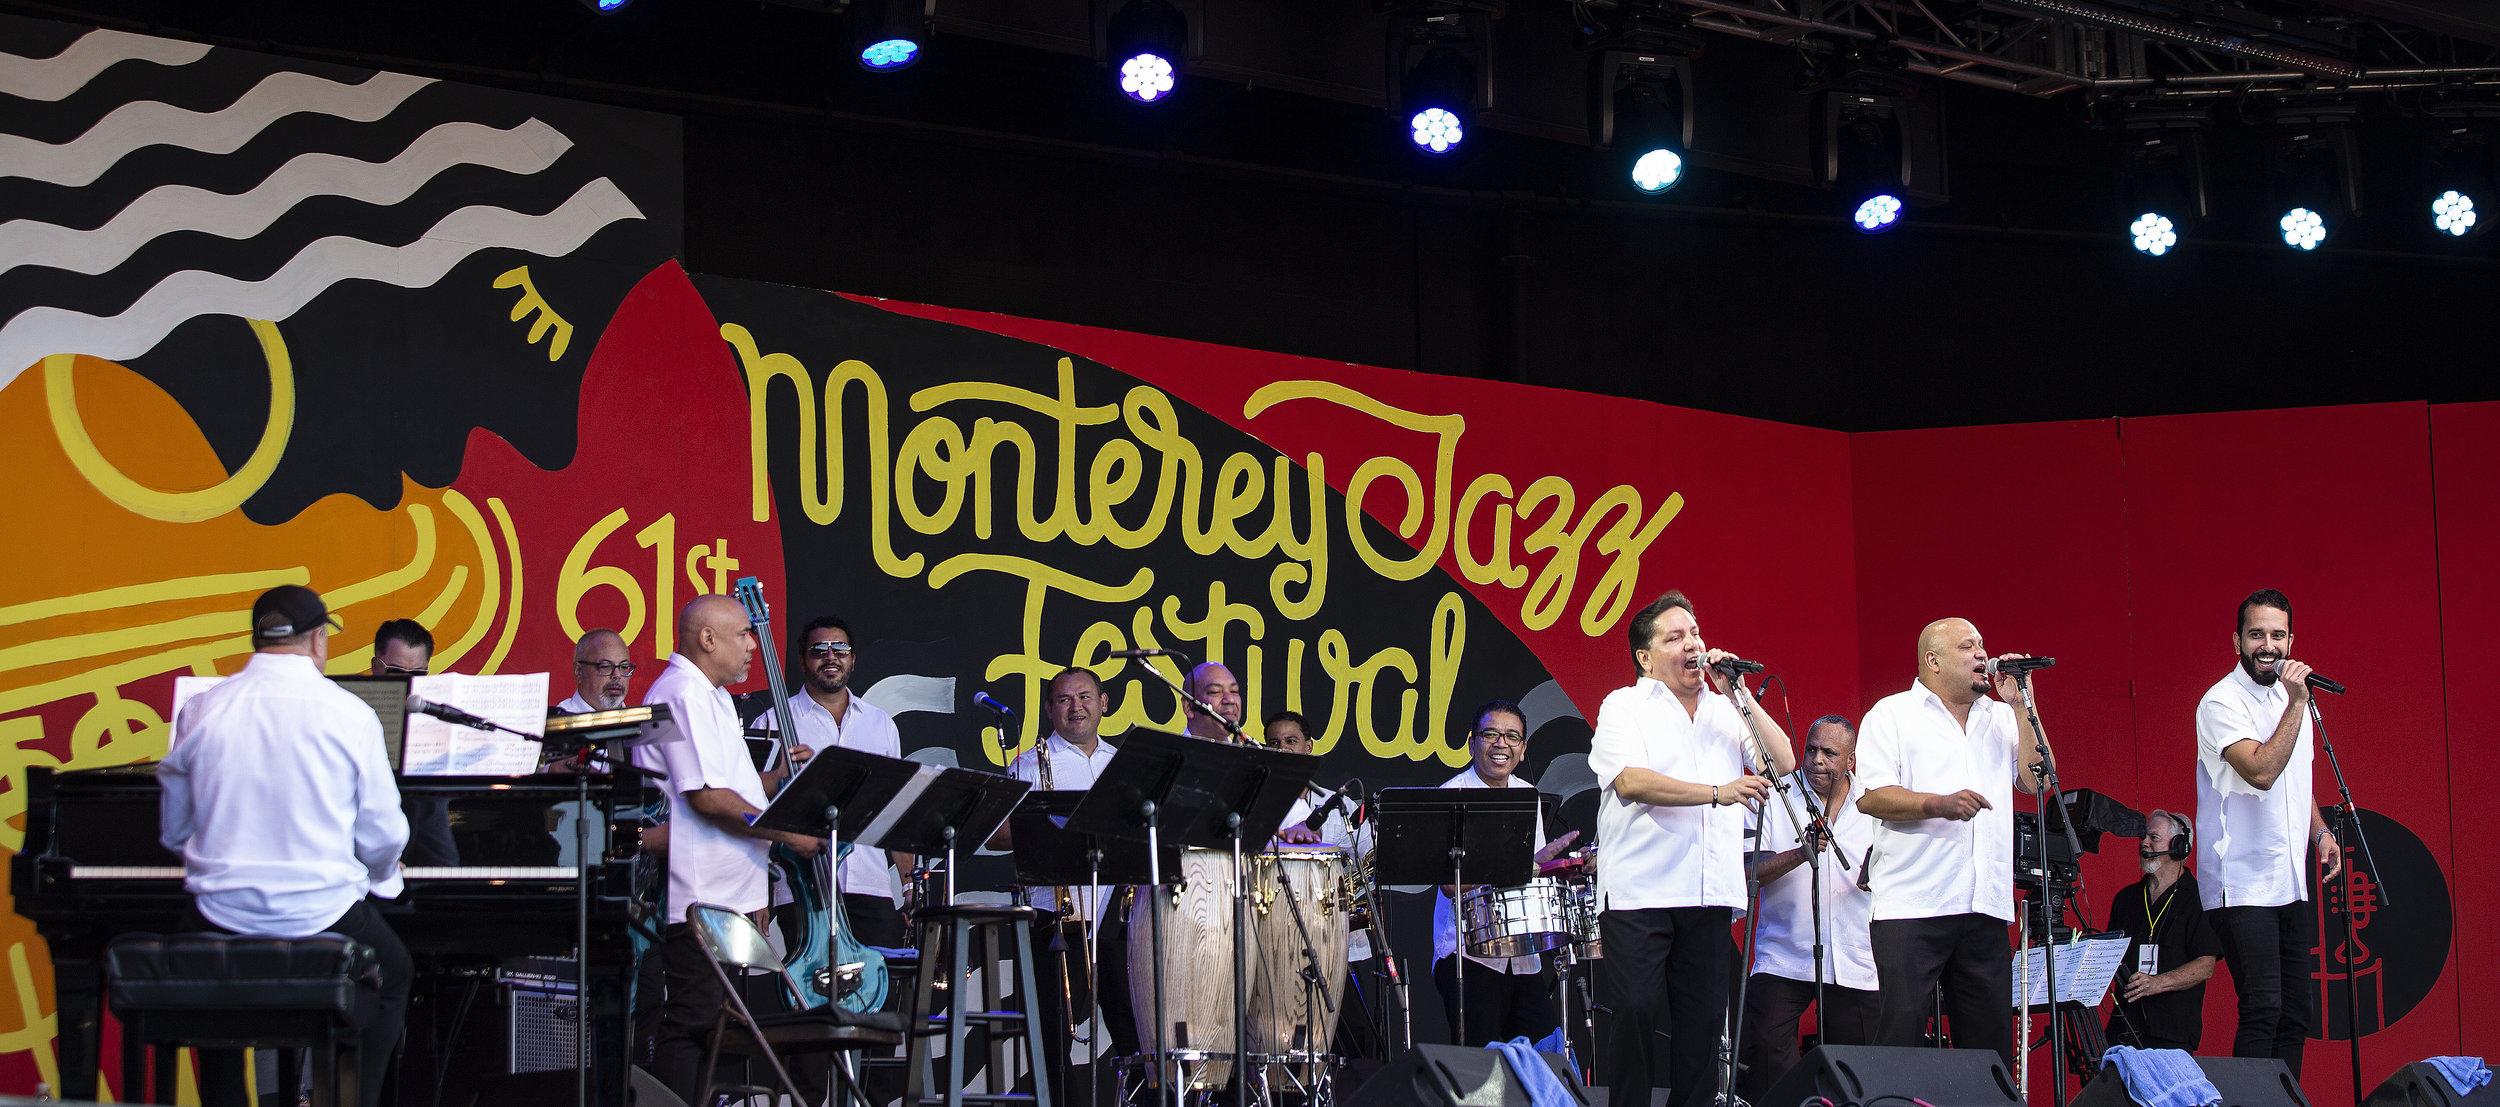 Spanish Harlem Orchestra  at the 61st Annual Monterey Jazz Festival